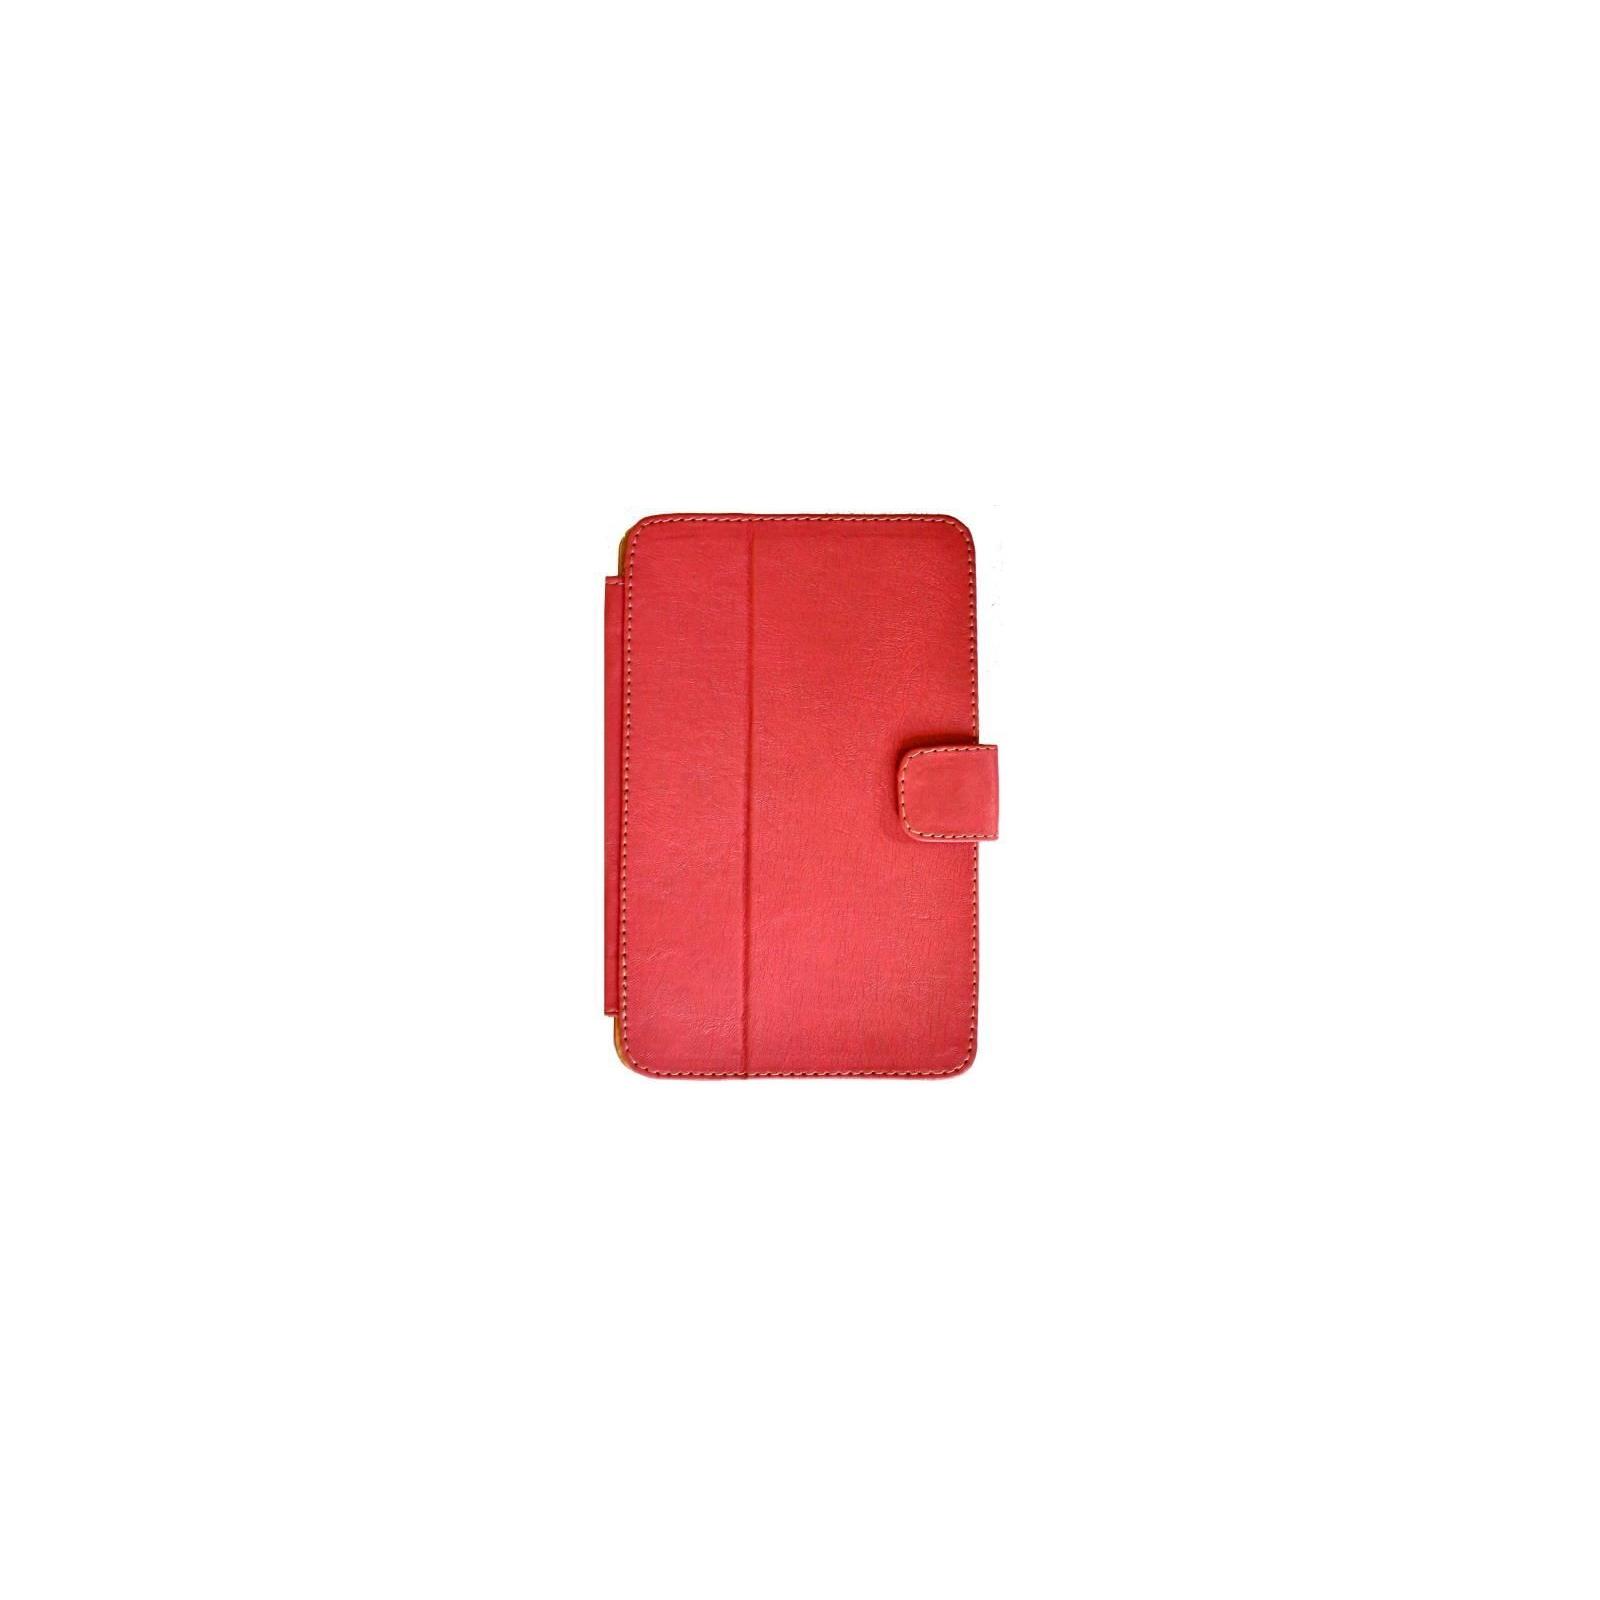 Чехол для планшета Vento 9.7 COOL - red